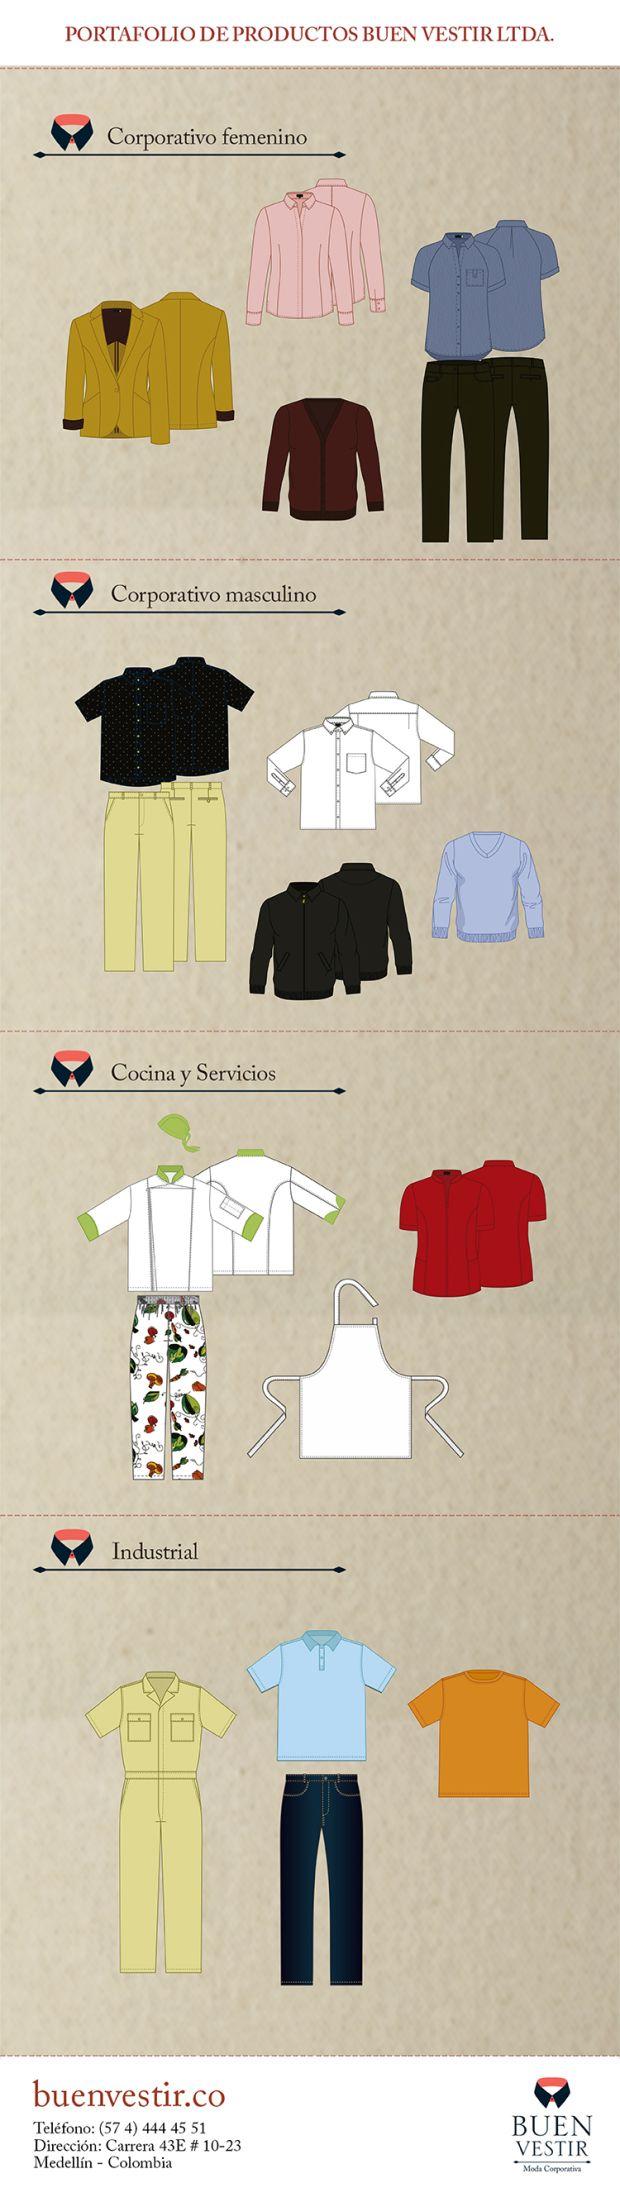 Buen Vestir, Moda Corporativa, Productos, portafolio